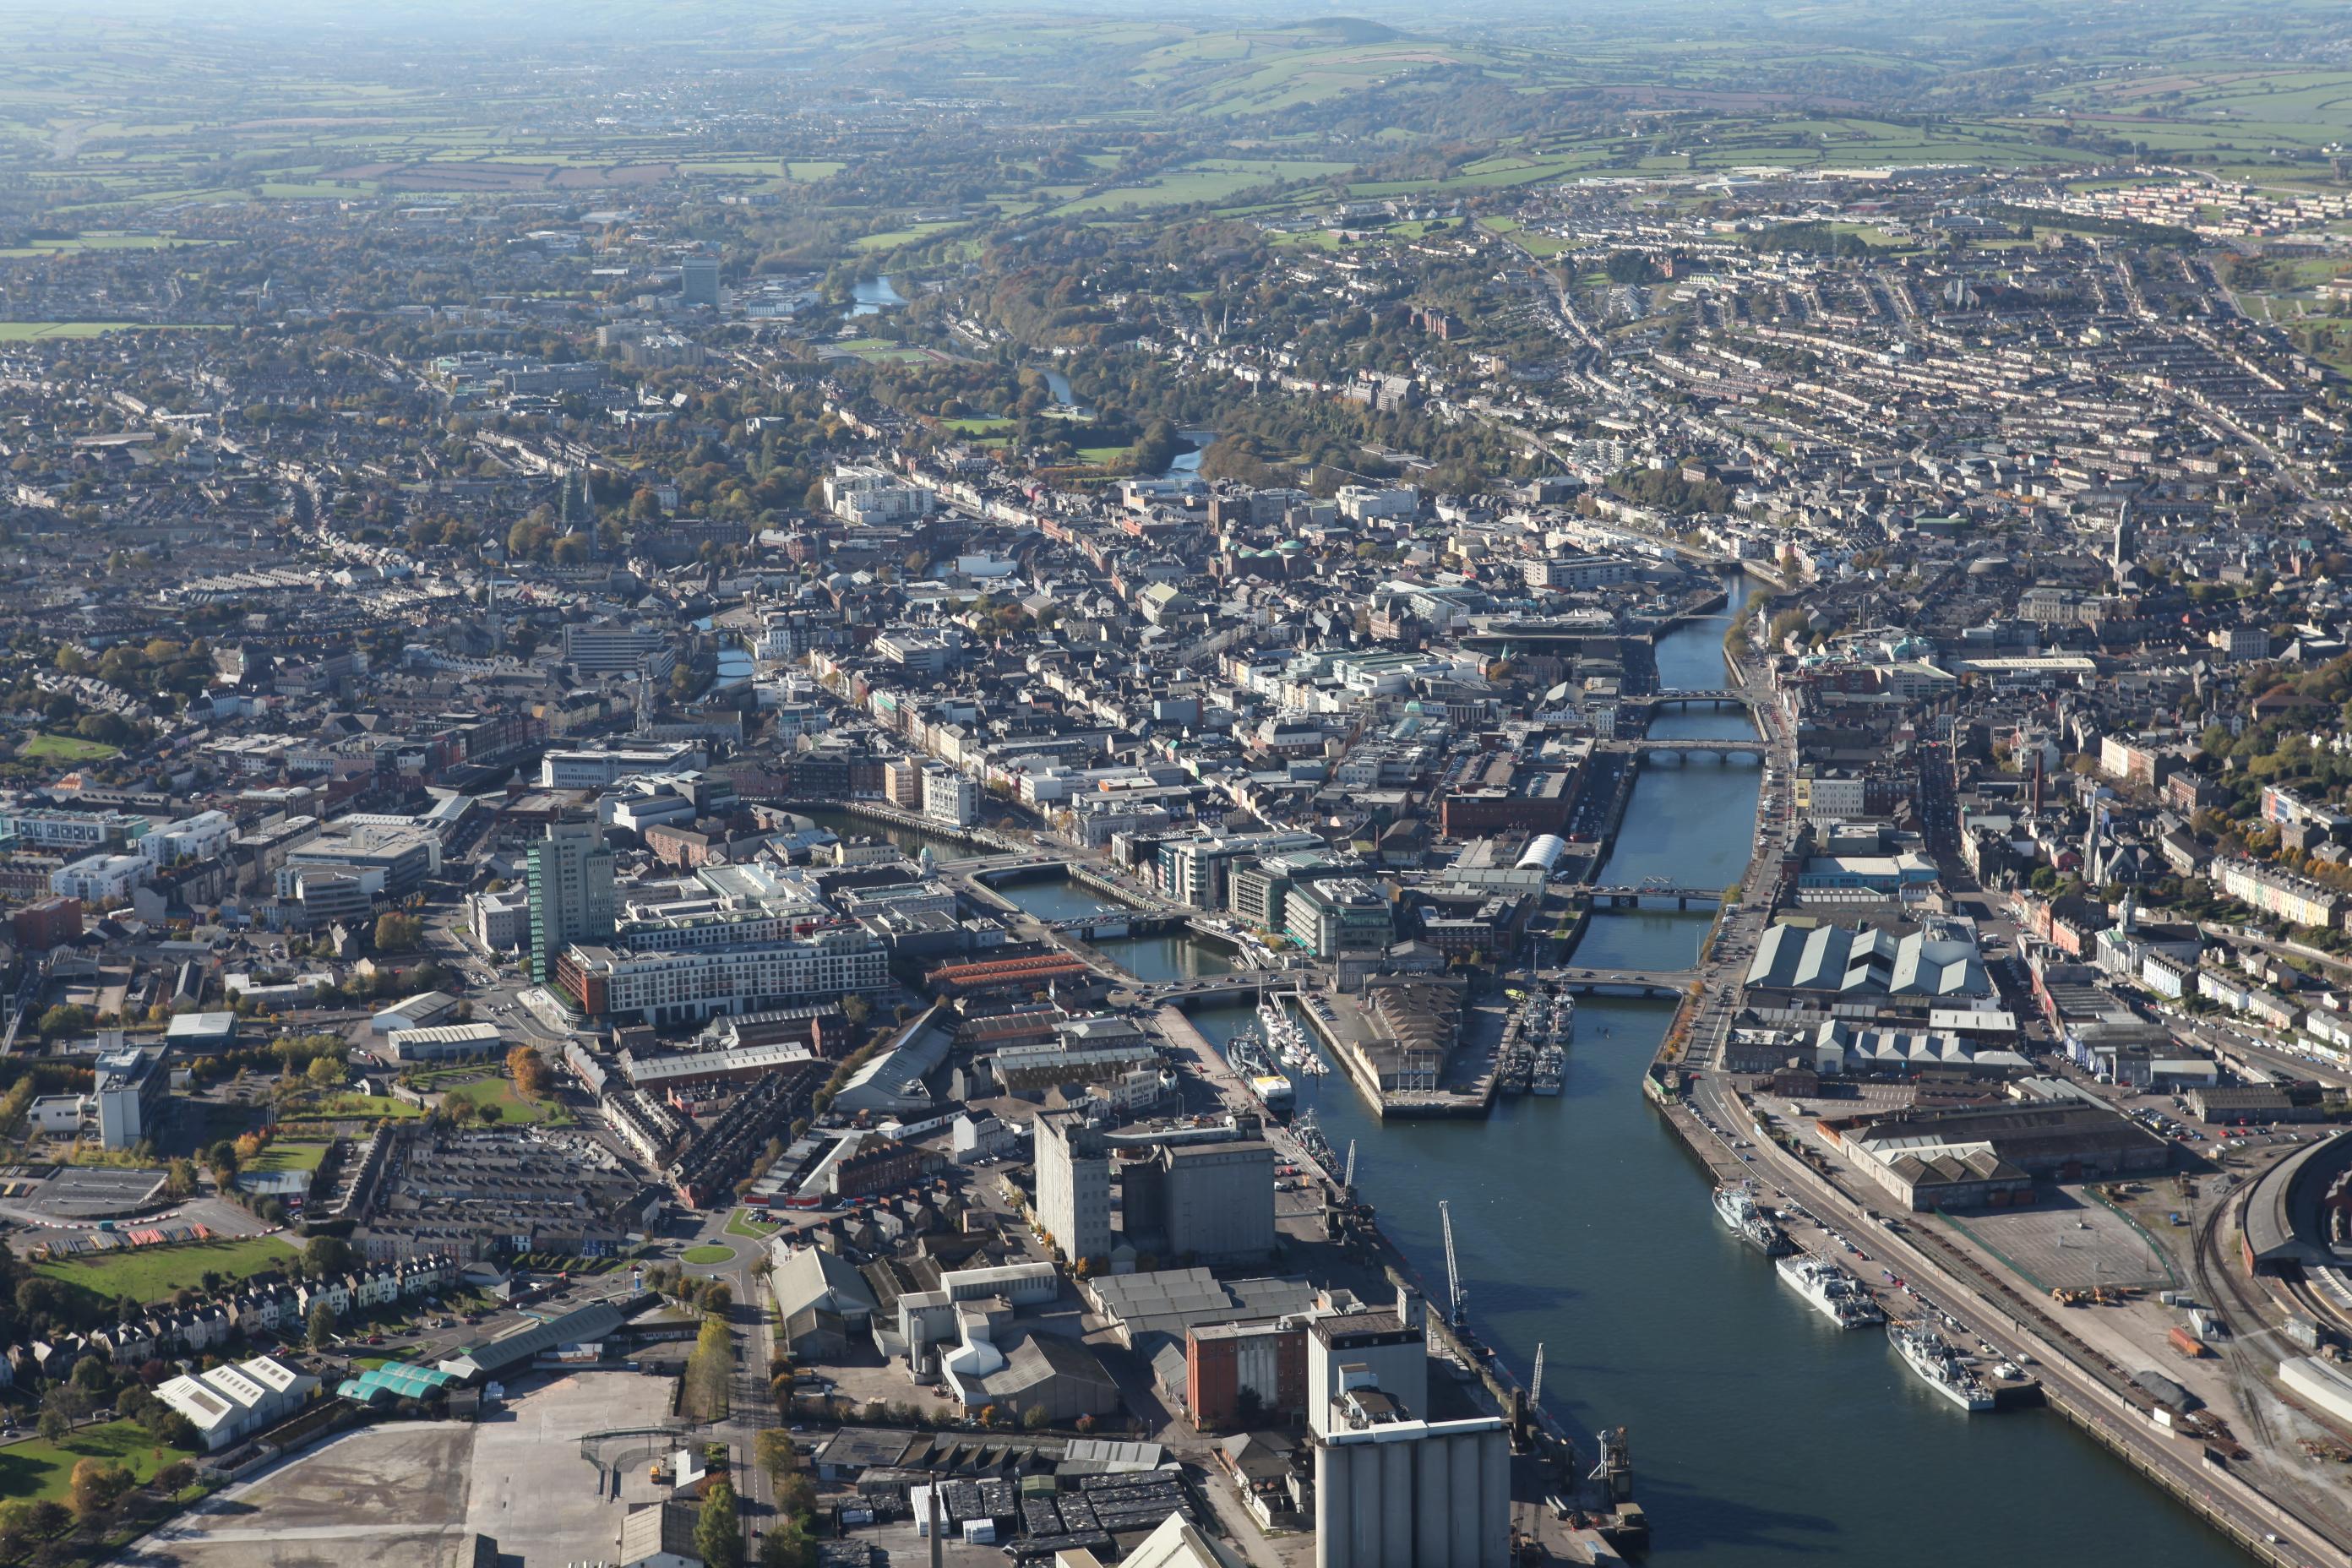 Old photos of cork ireland Aerial photos of Ireland CORK DUBLIN LIMERICK